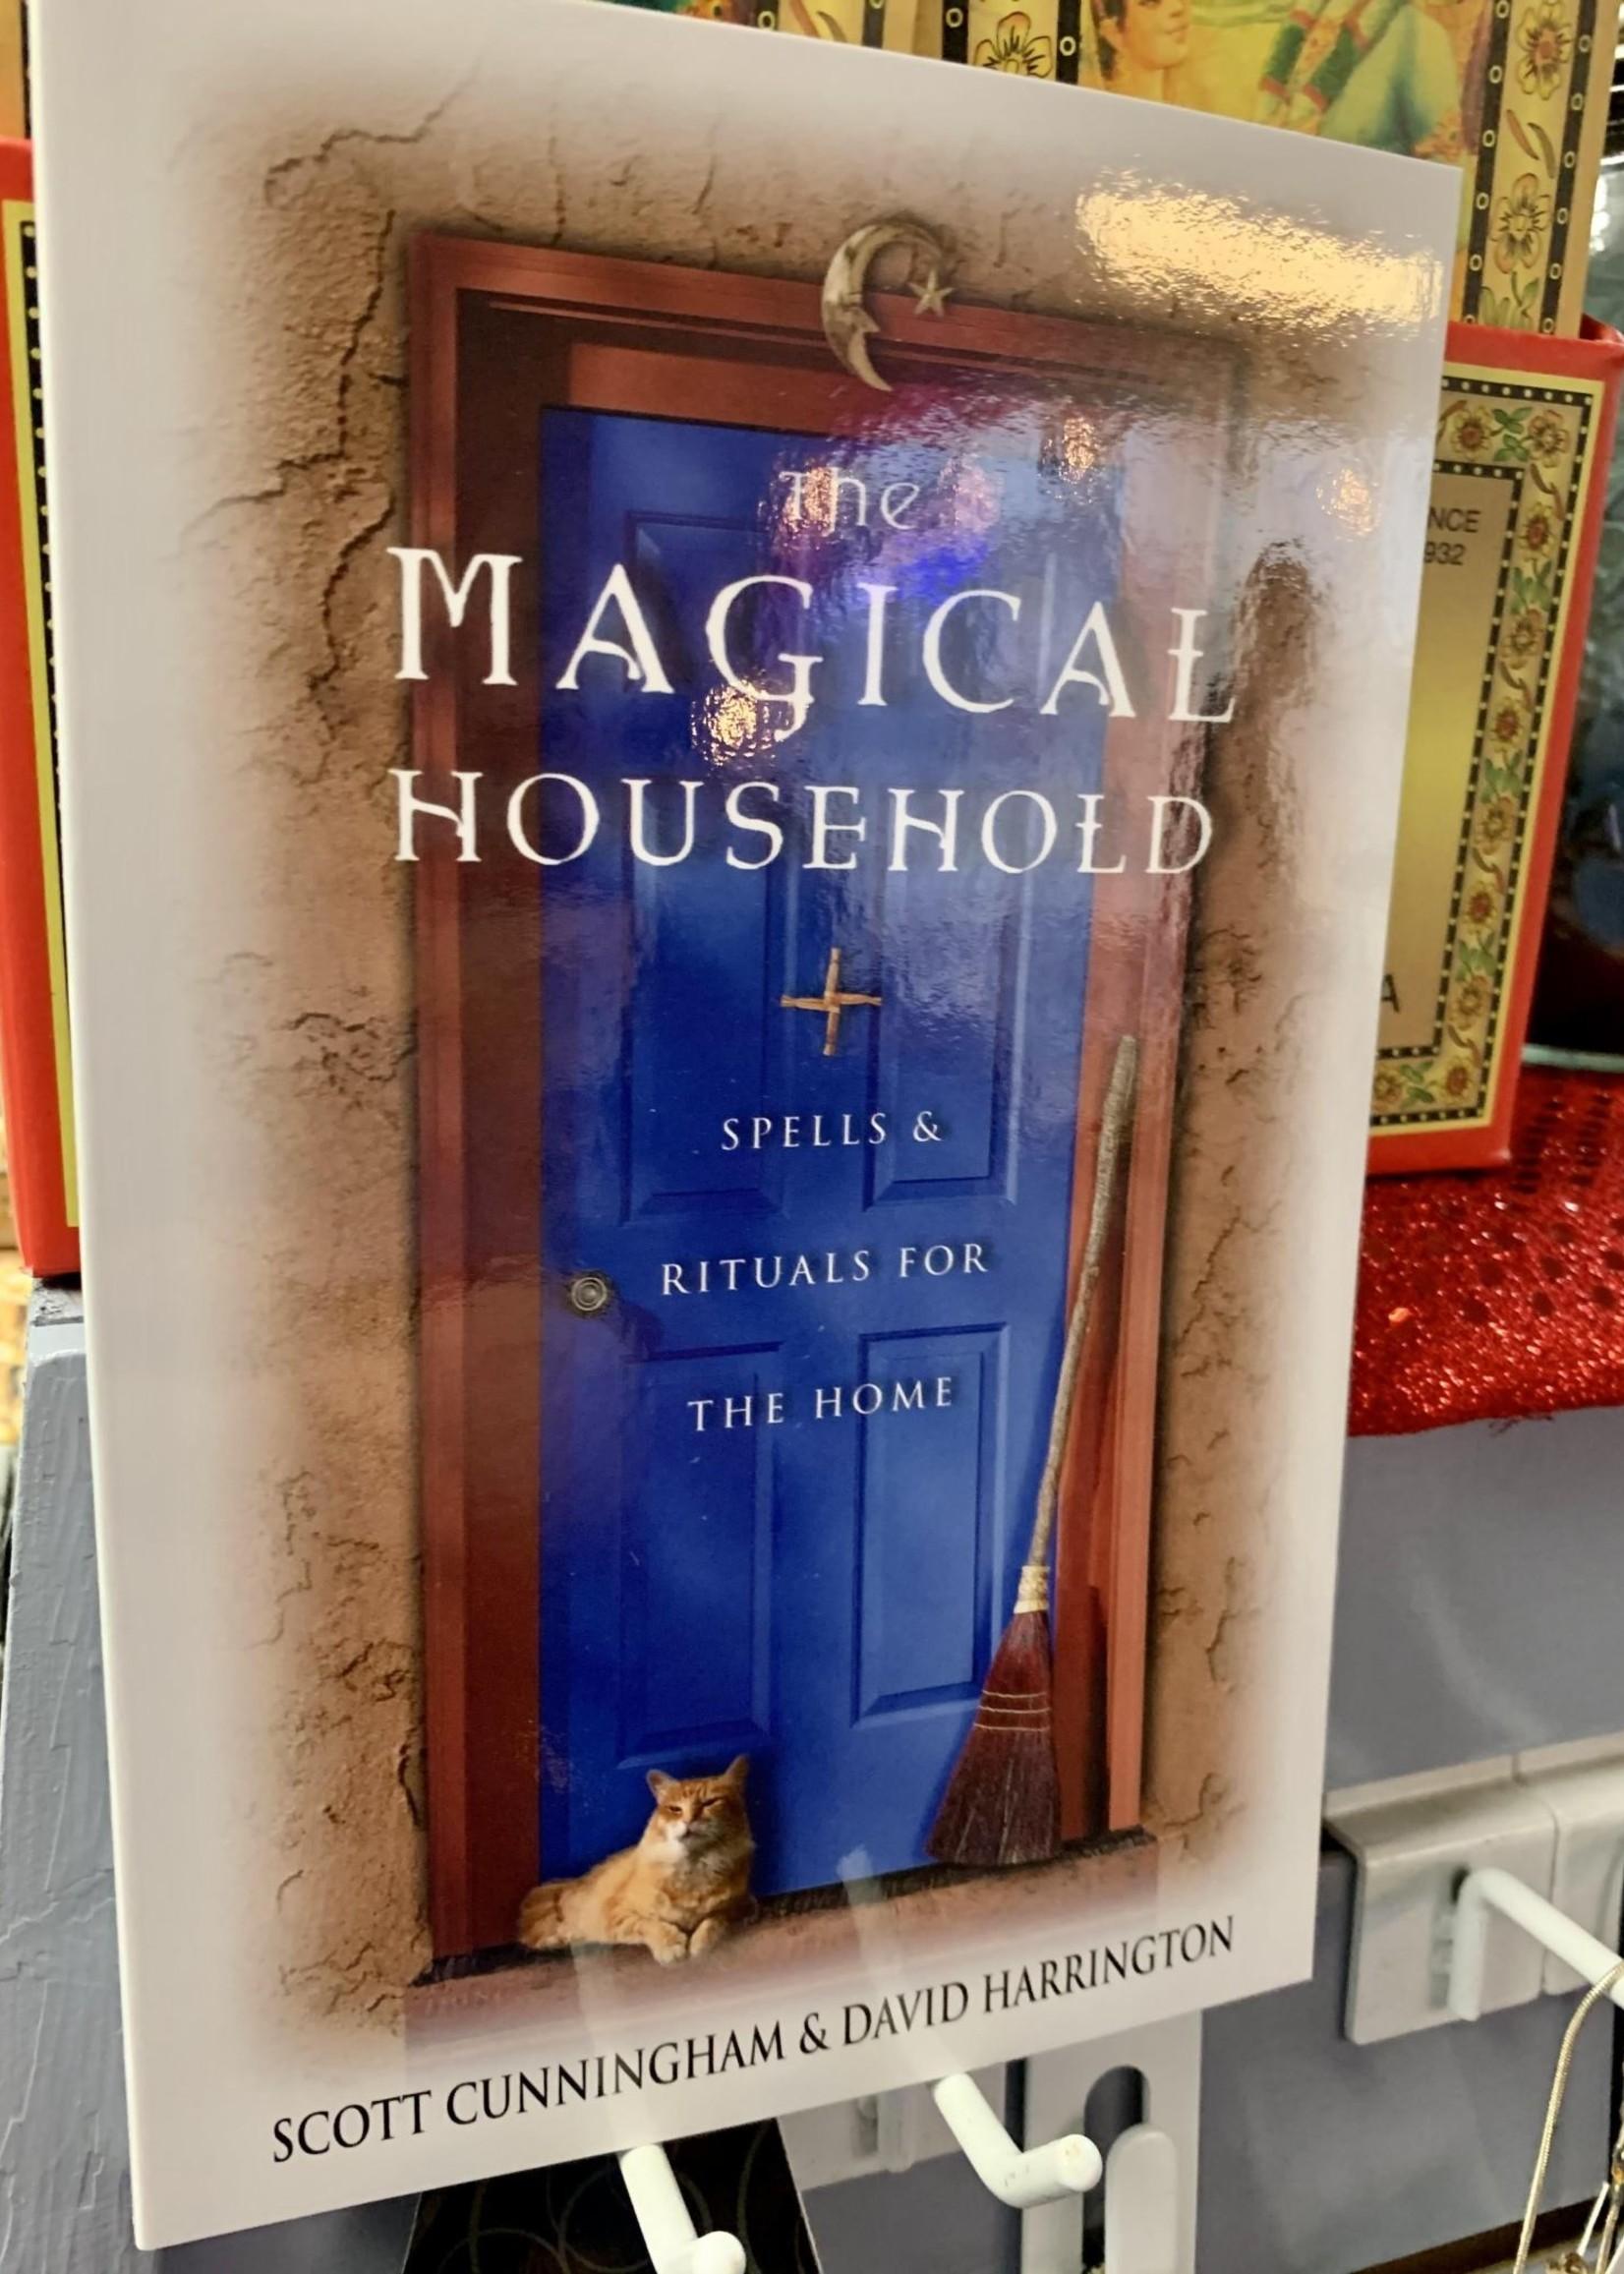 The Magical Household - BY SCOTT CUNNINGHAM, DAVID HARRINGTON